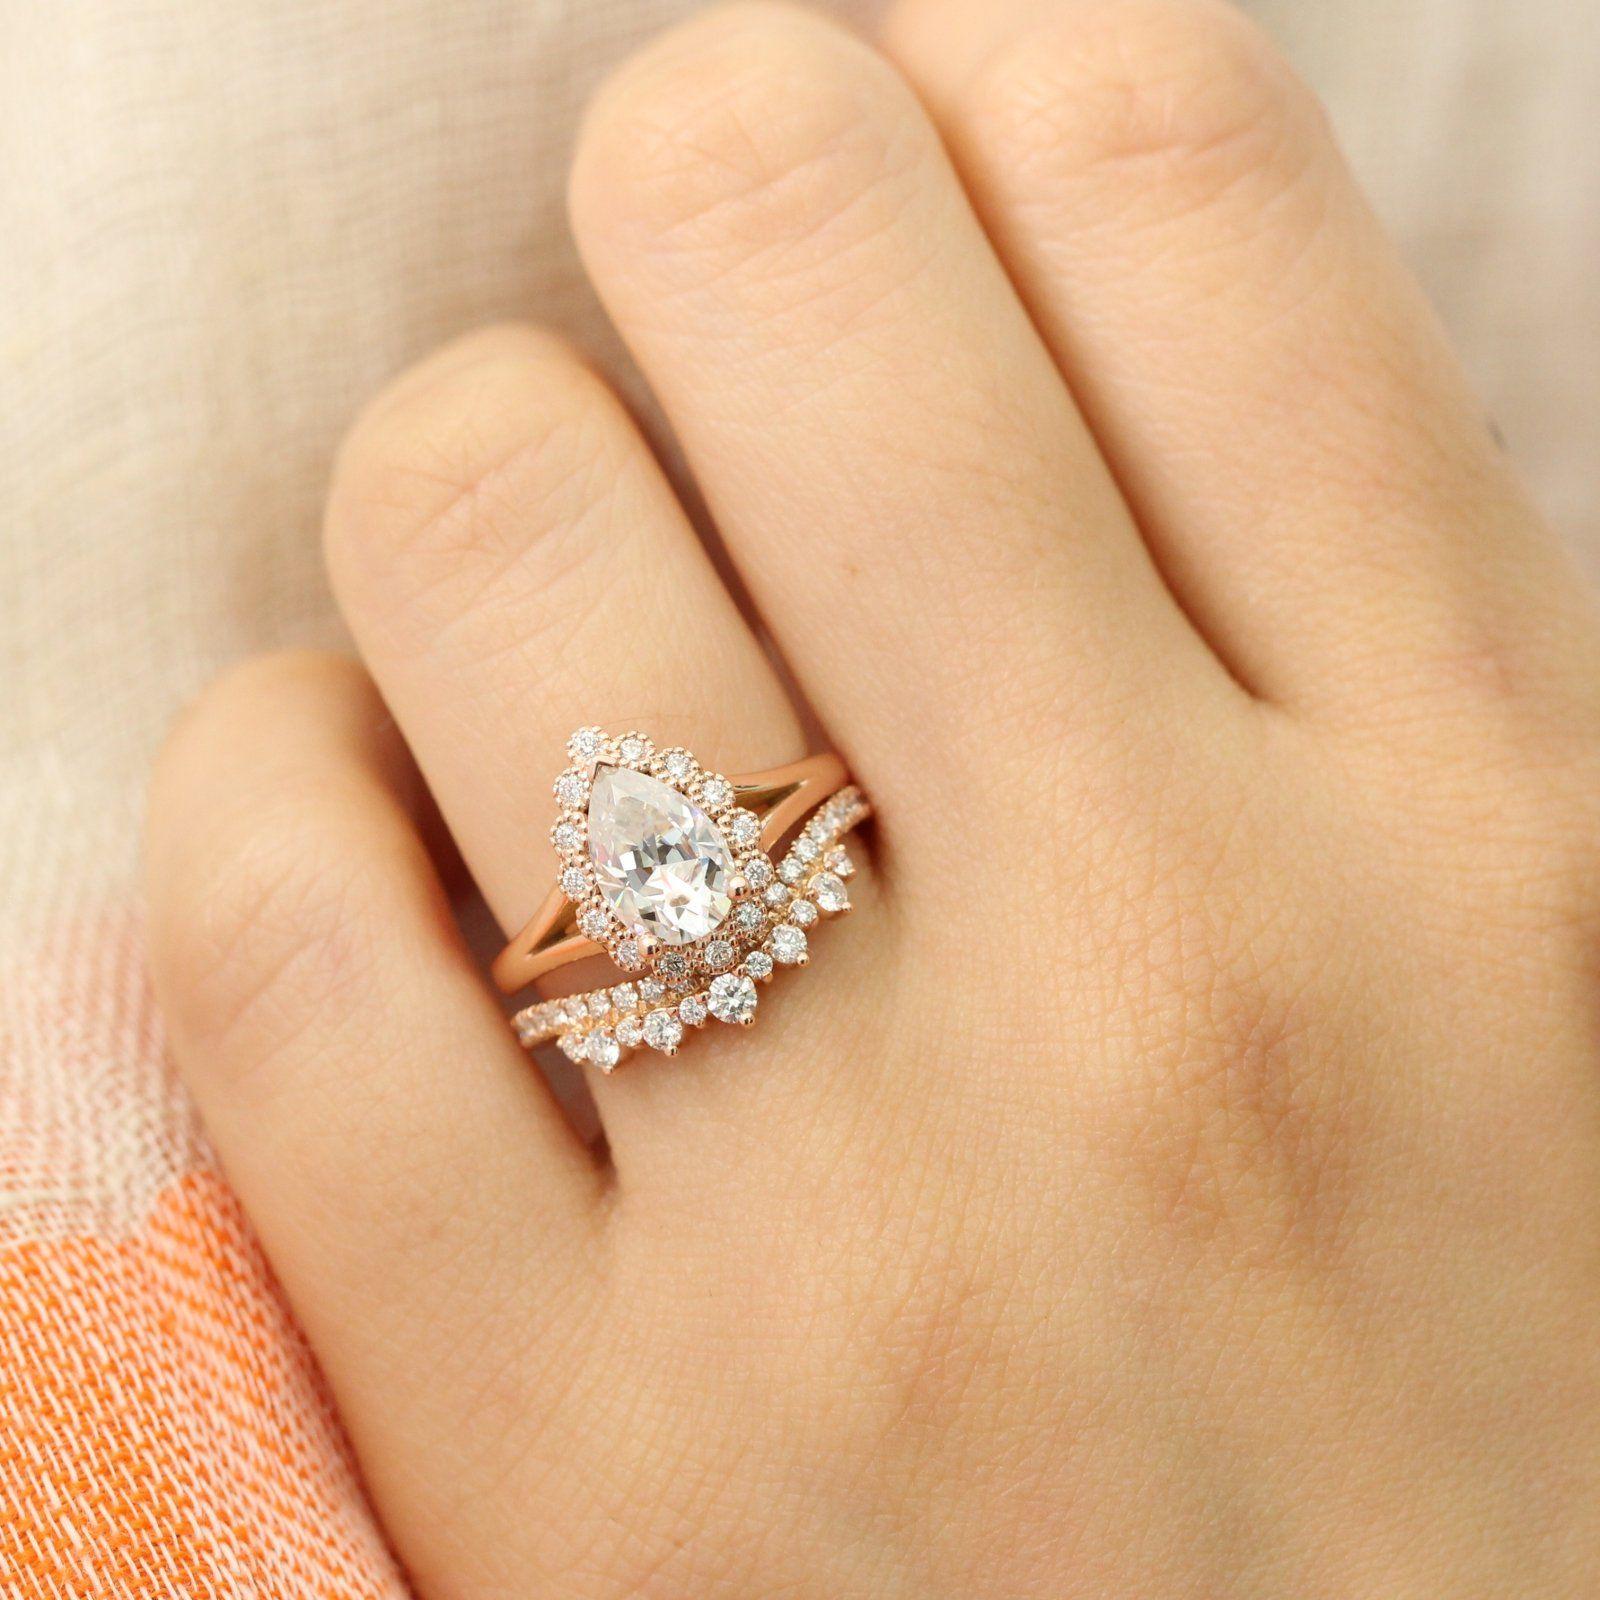 1.66 Carat Bezel Pear Cut Moissanite Antique Engagement Ring Set 14k White Gold